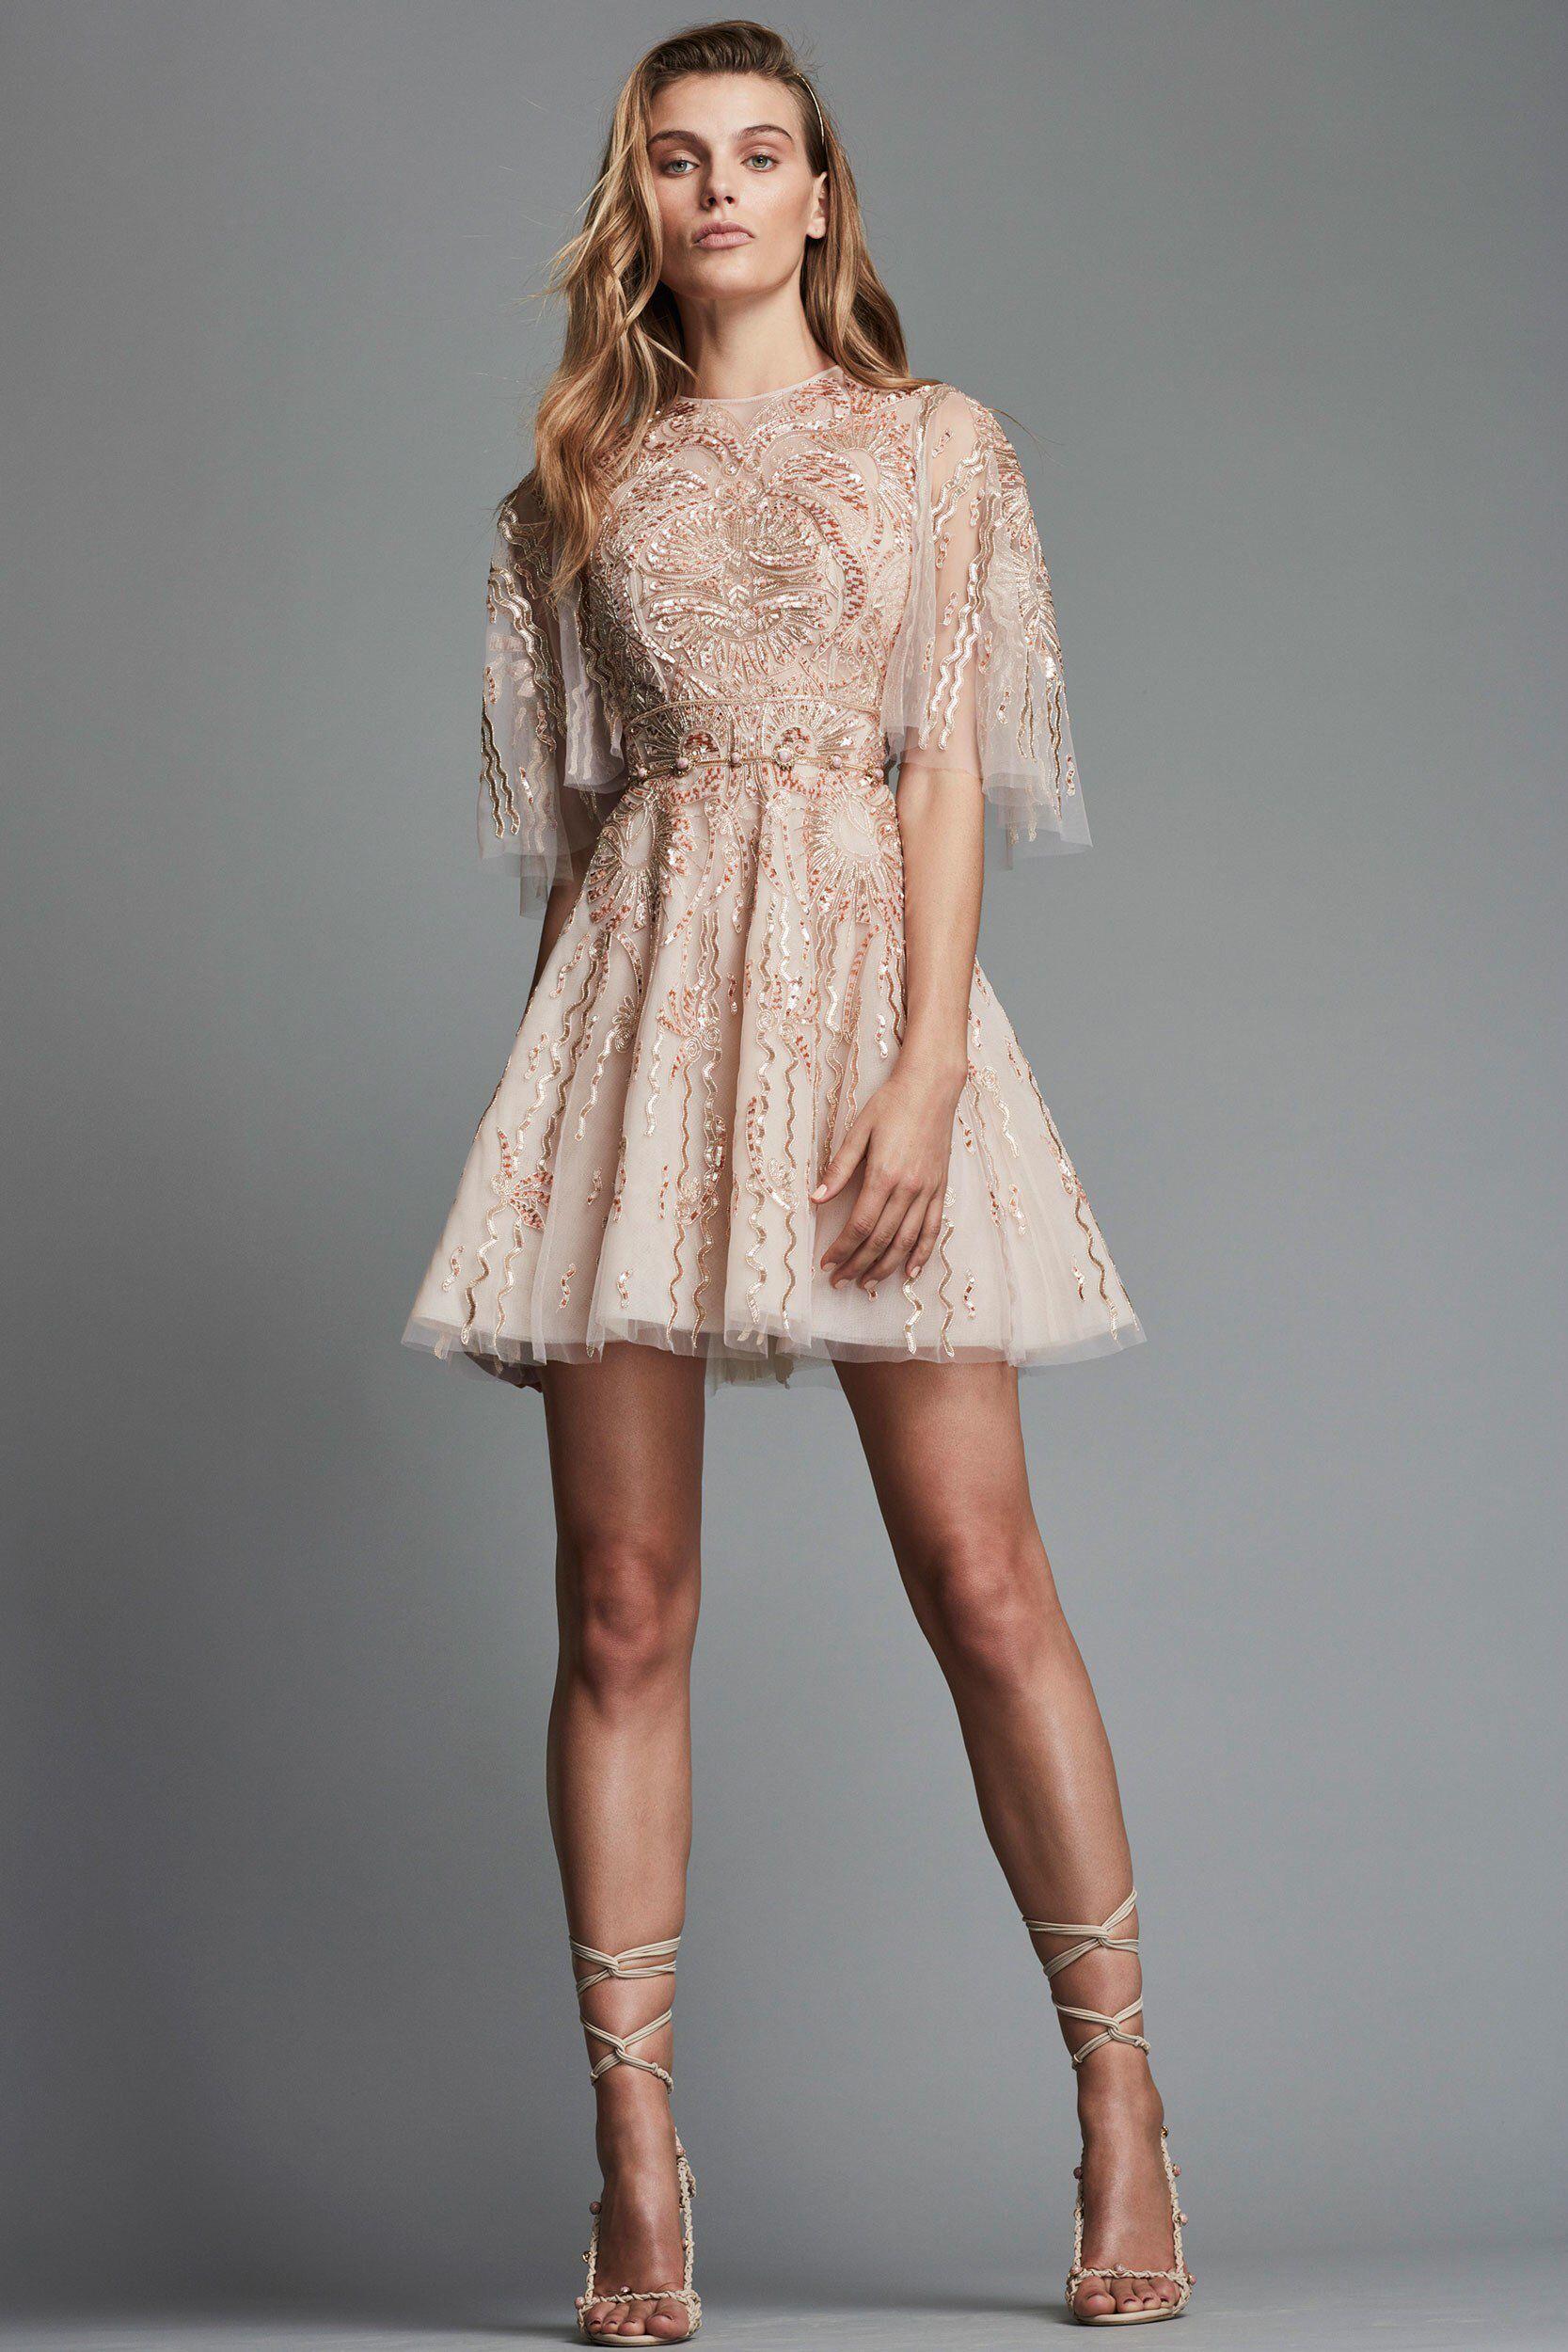 Zuhair murad spring readytowear fashion show femme fashion